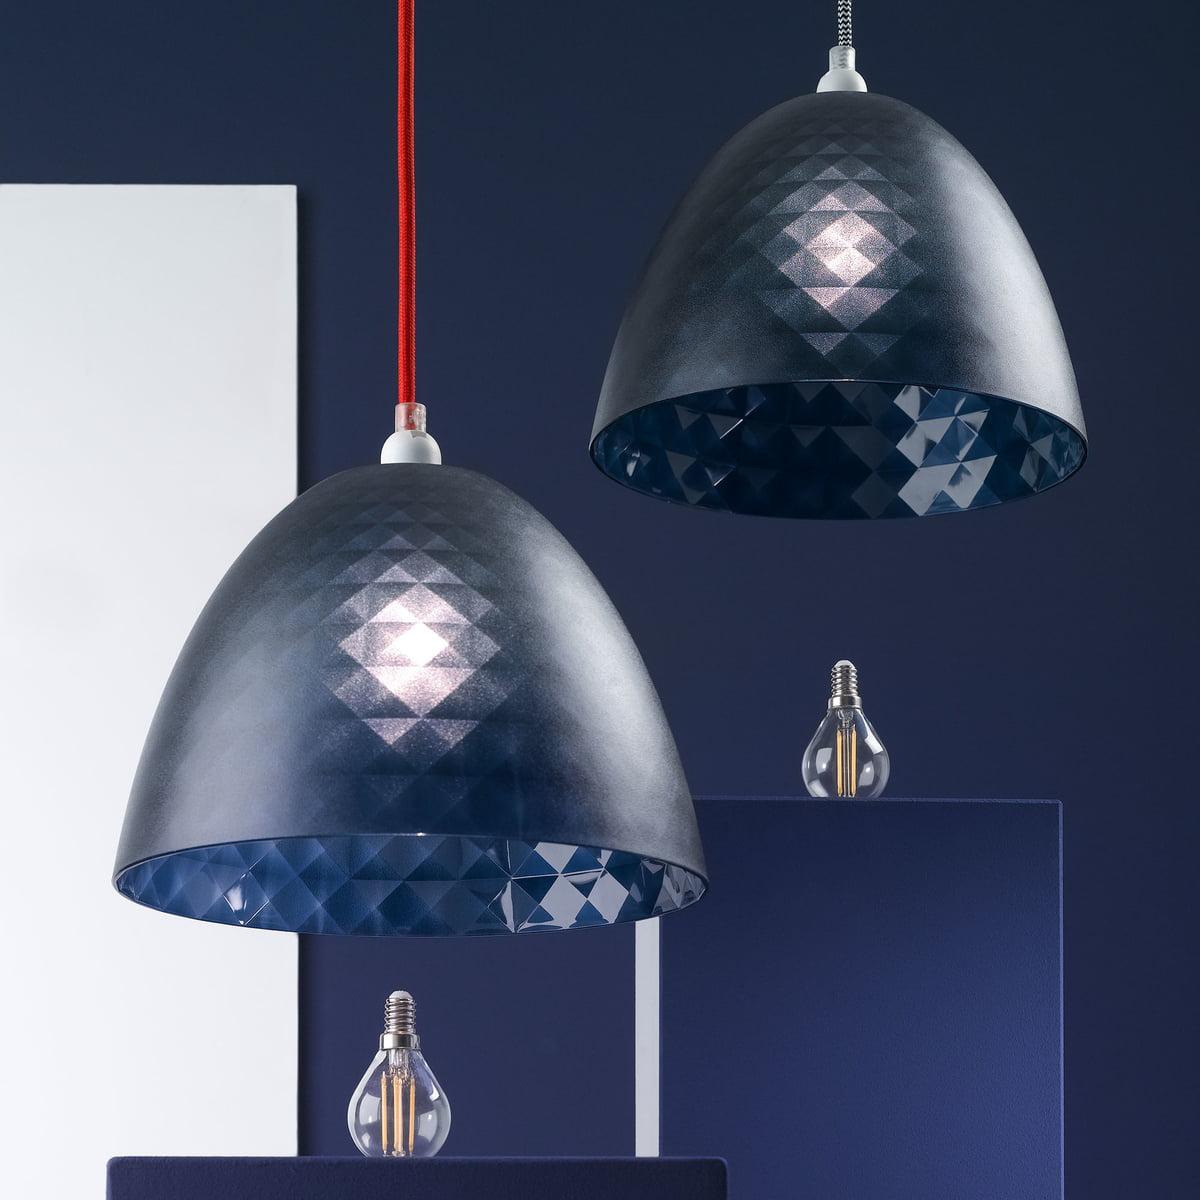 Koziol Hanglamp Stella M.Koziol Stella Silk Lampshade S Transparent Clear